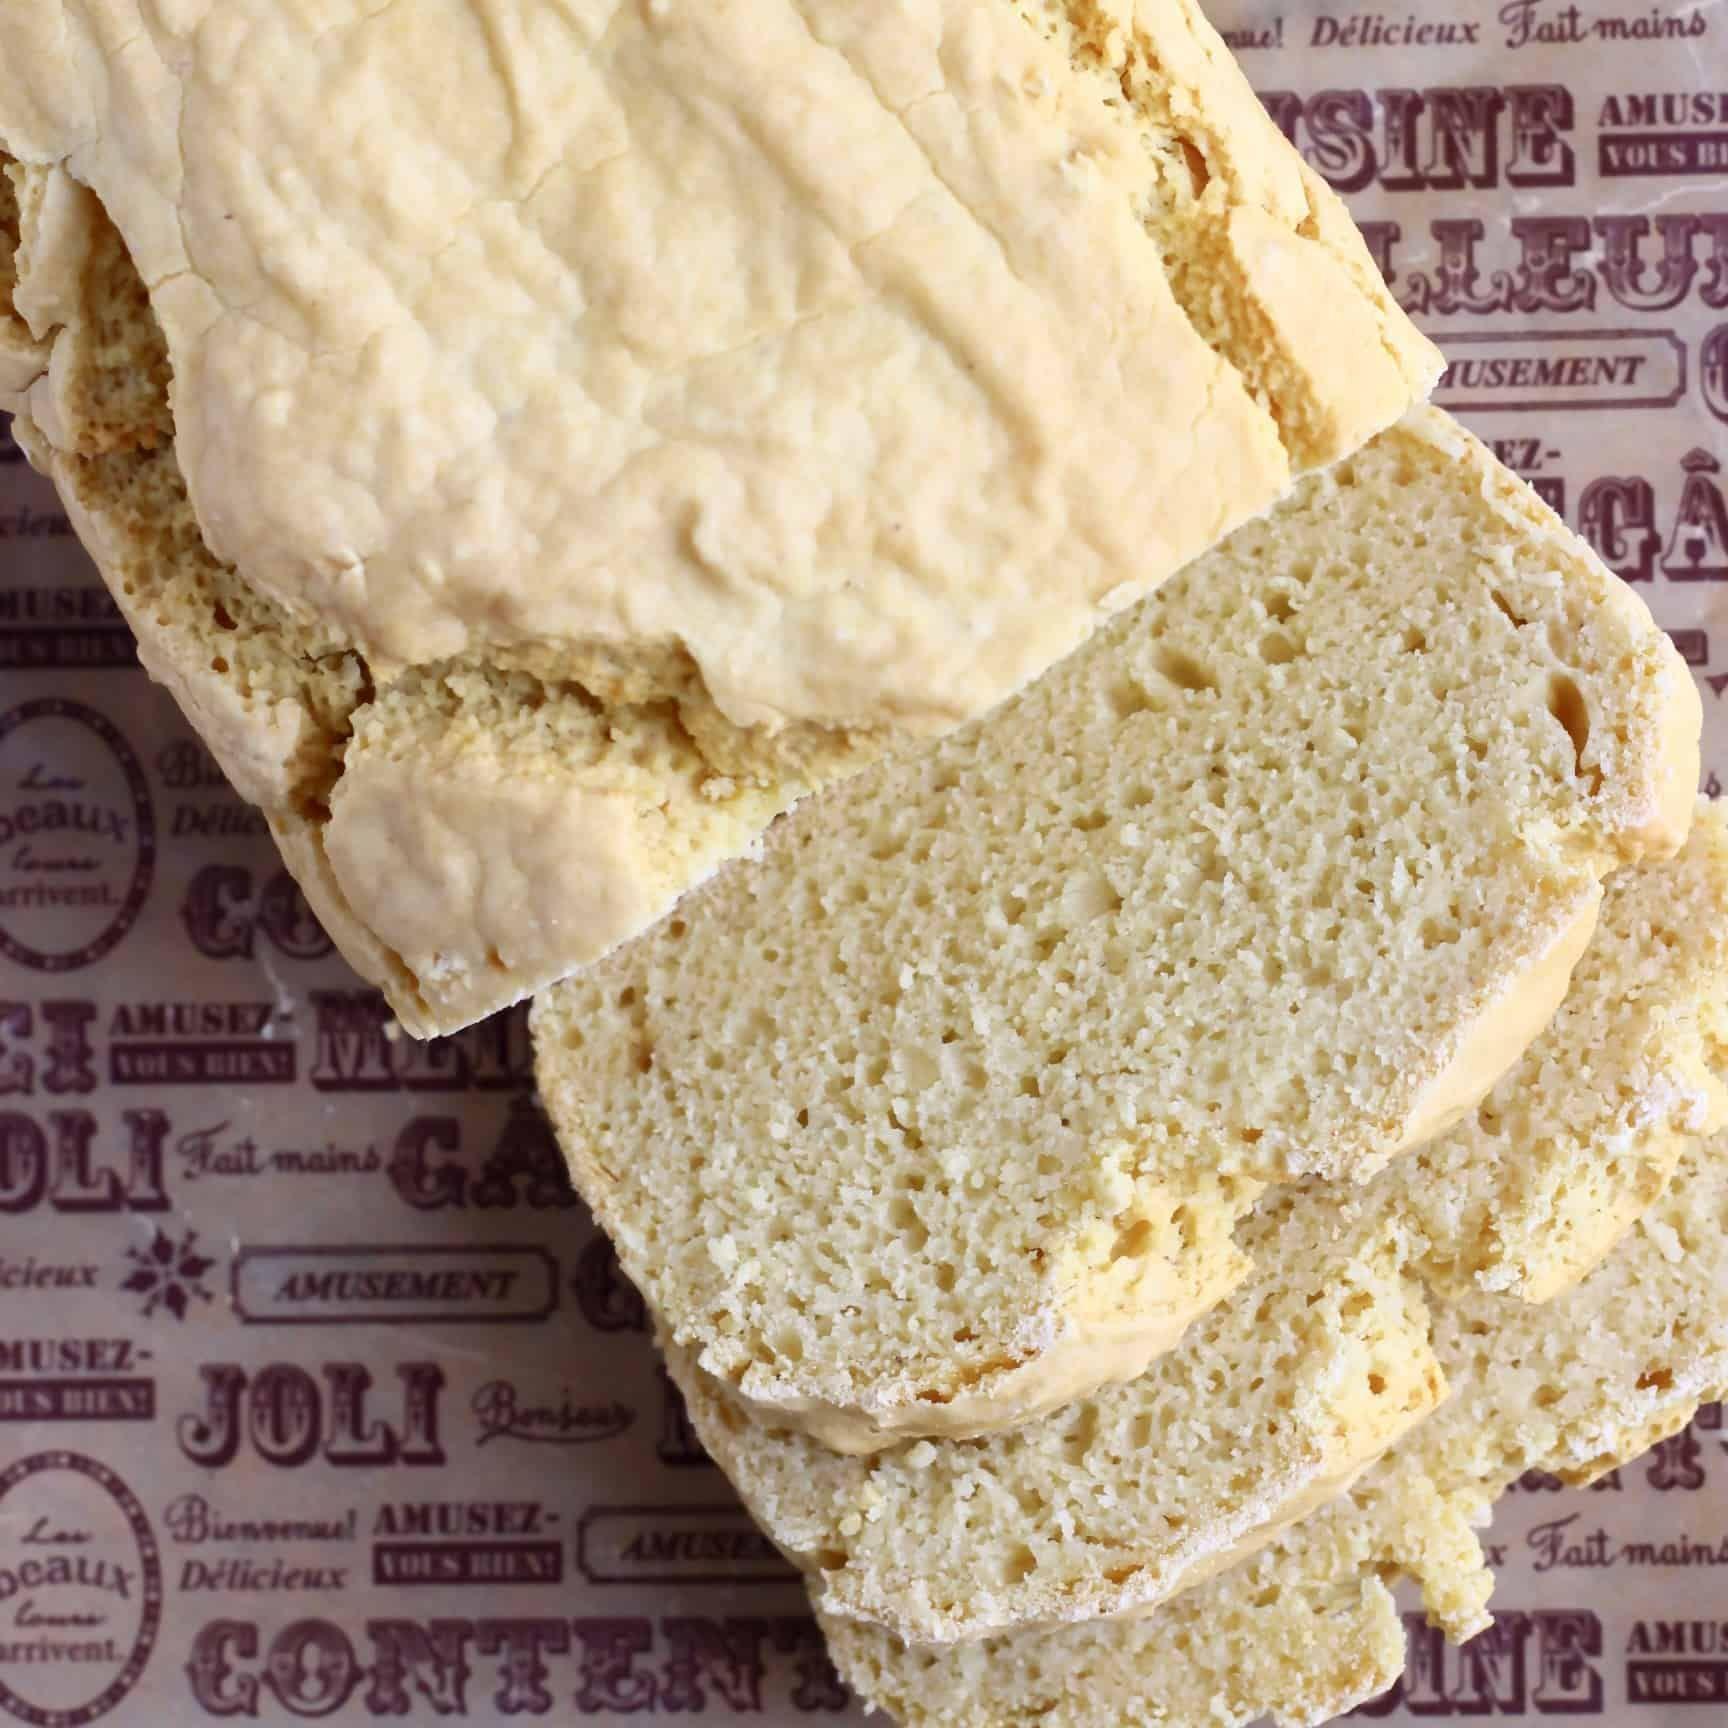 28 Vegan Freezer Meals Gluten Free Rhian S Recipes In 2020 Yeast Free Breads Gluten Free Vegan Bread Gluten Free Yeast Free